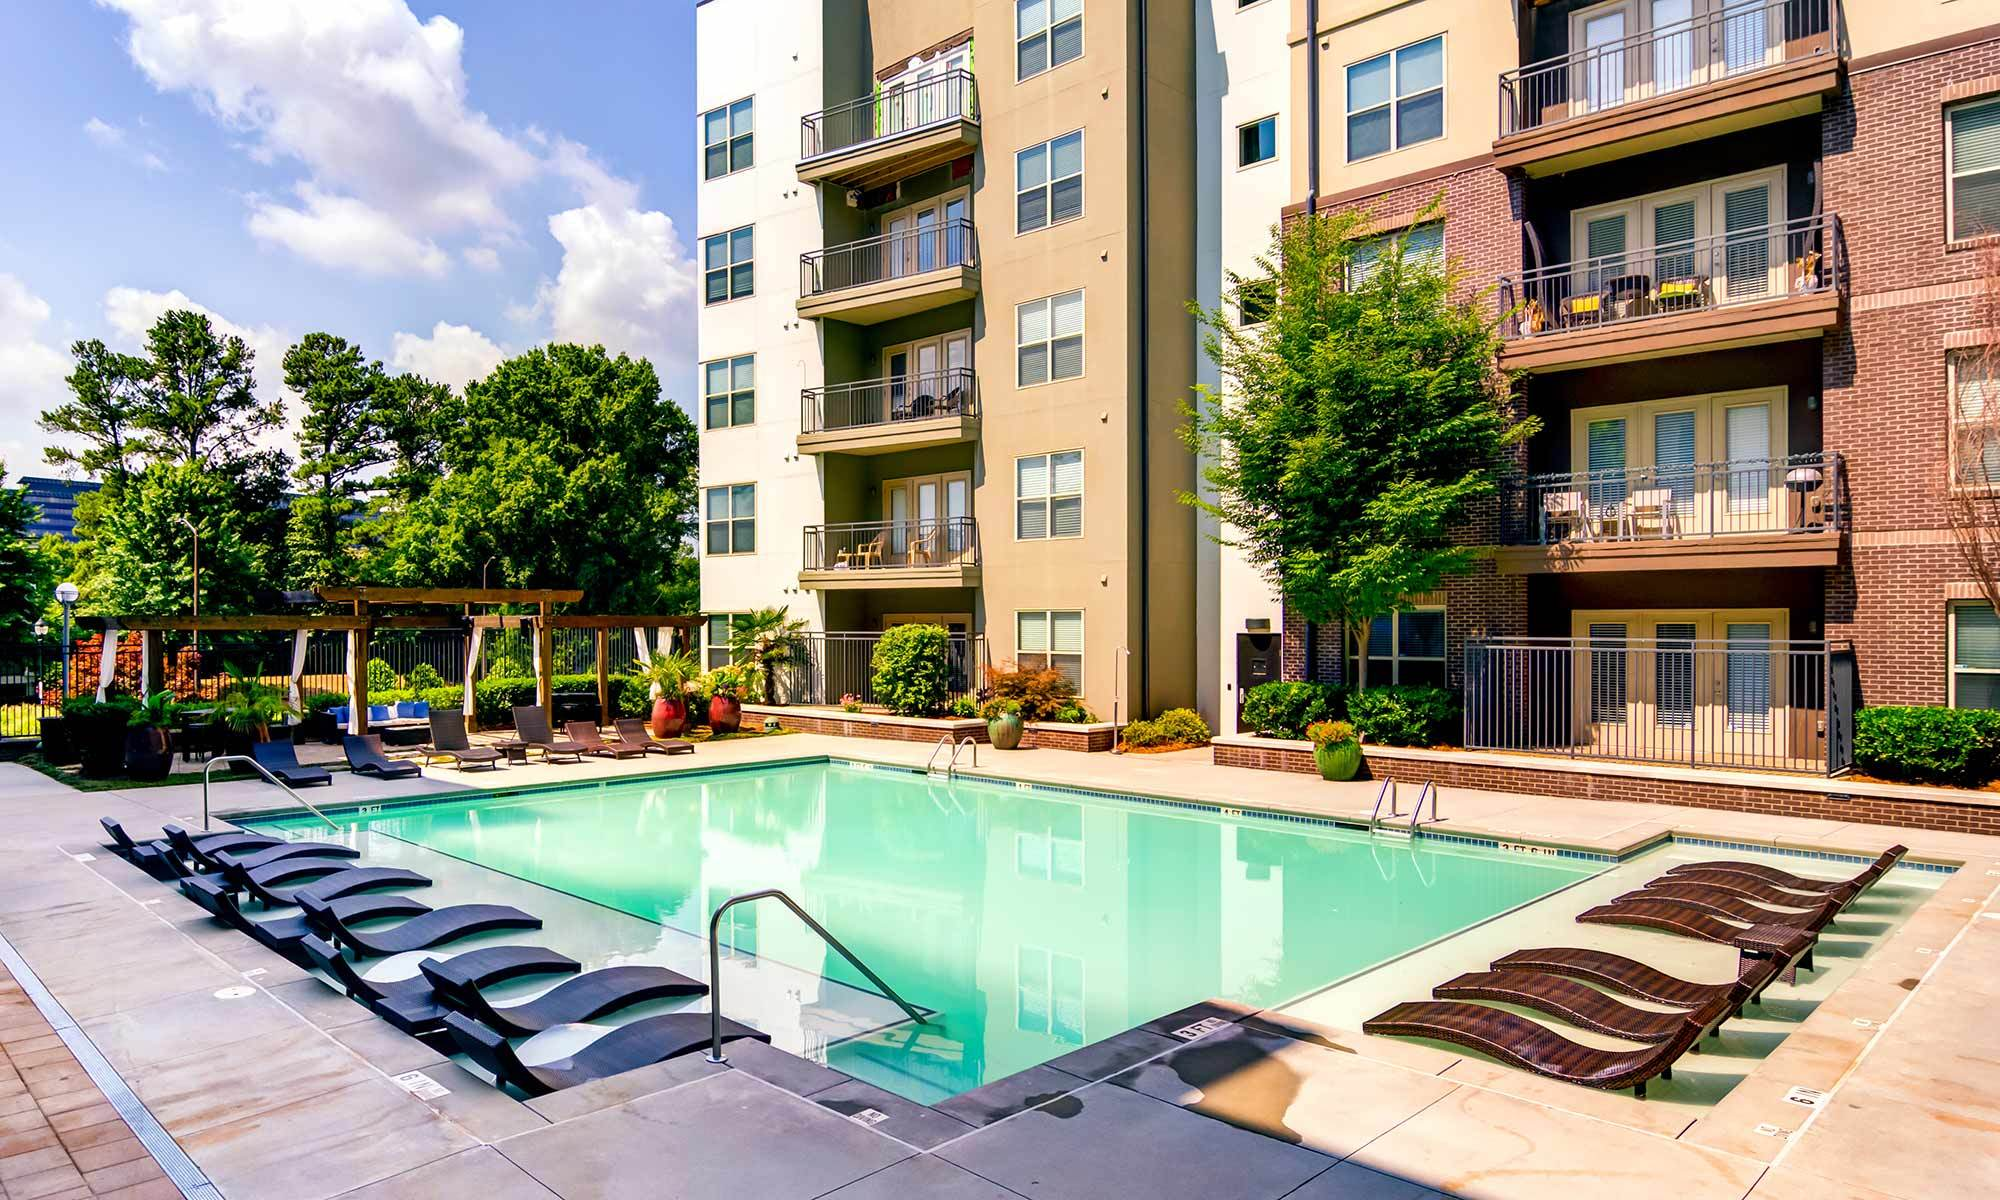 apartments for rent in atlanta ga near sandy springs marq eight apartments in atlanta ga